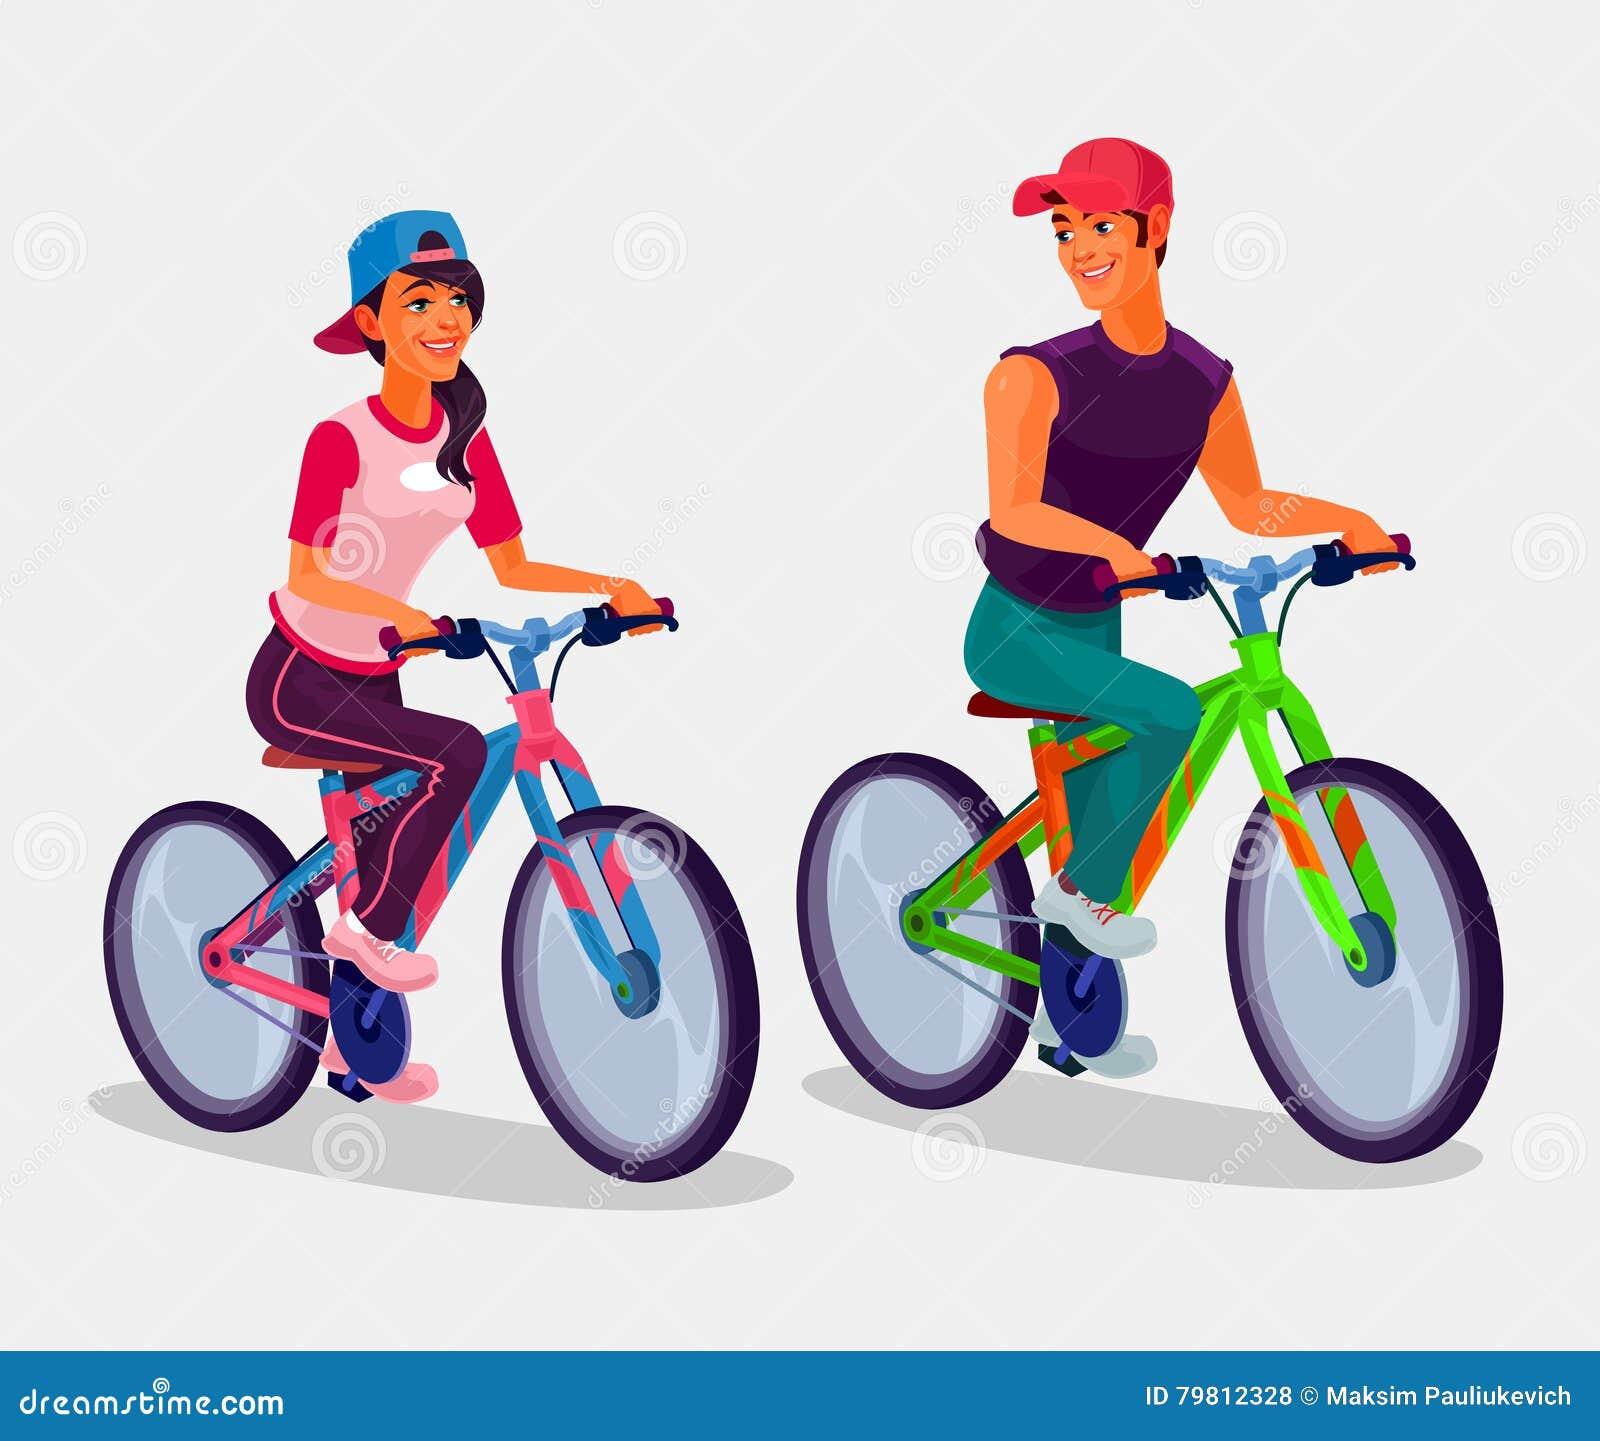 Sportsman Cartoons, Illustrations & Vector Stock Images ...